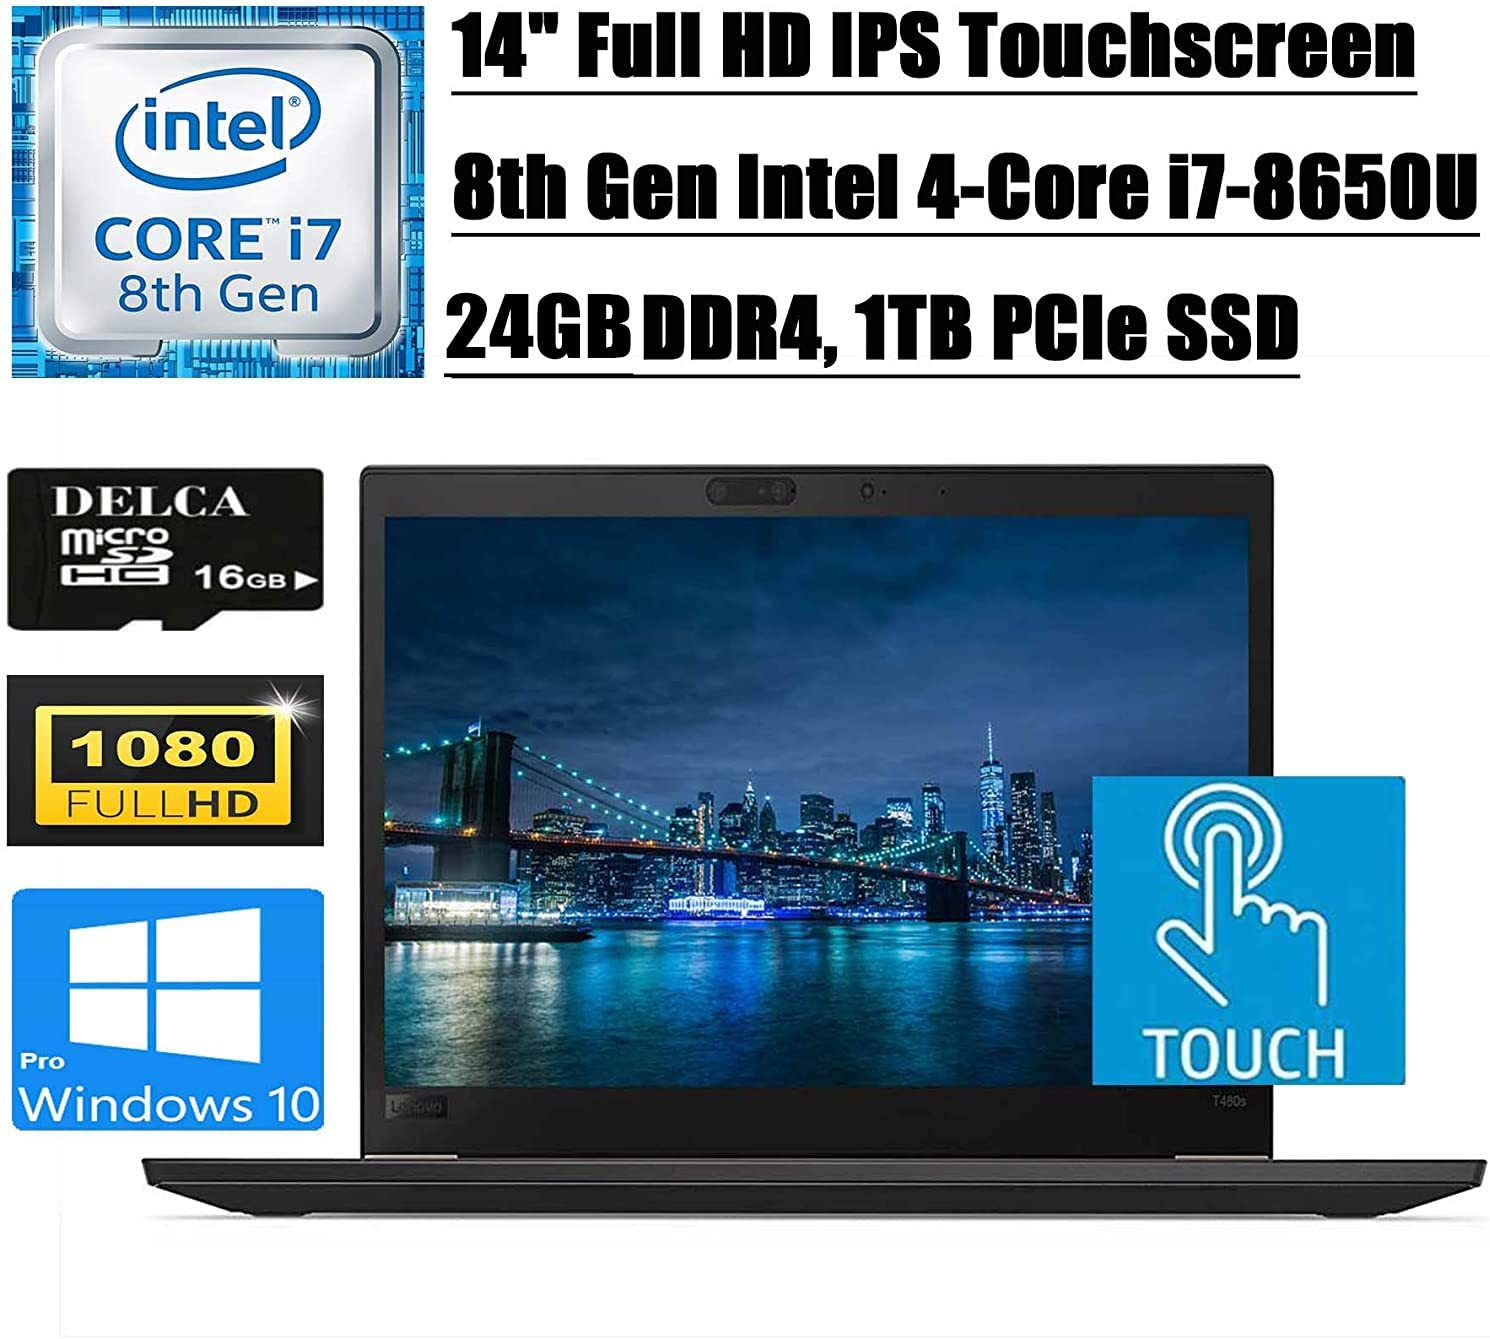 "Lenovo Thinkpad T480S Premium 2020 Business Laptop I 14"" FHD IPS Touchscreen I Intel Quad-Core i7-8650U I 24GB DDR4 1TB PCIe SSD I Backlit KB FP ThunderboltWin 10 Pro + Delca 16GB Micro SD Card"